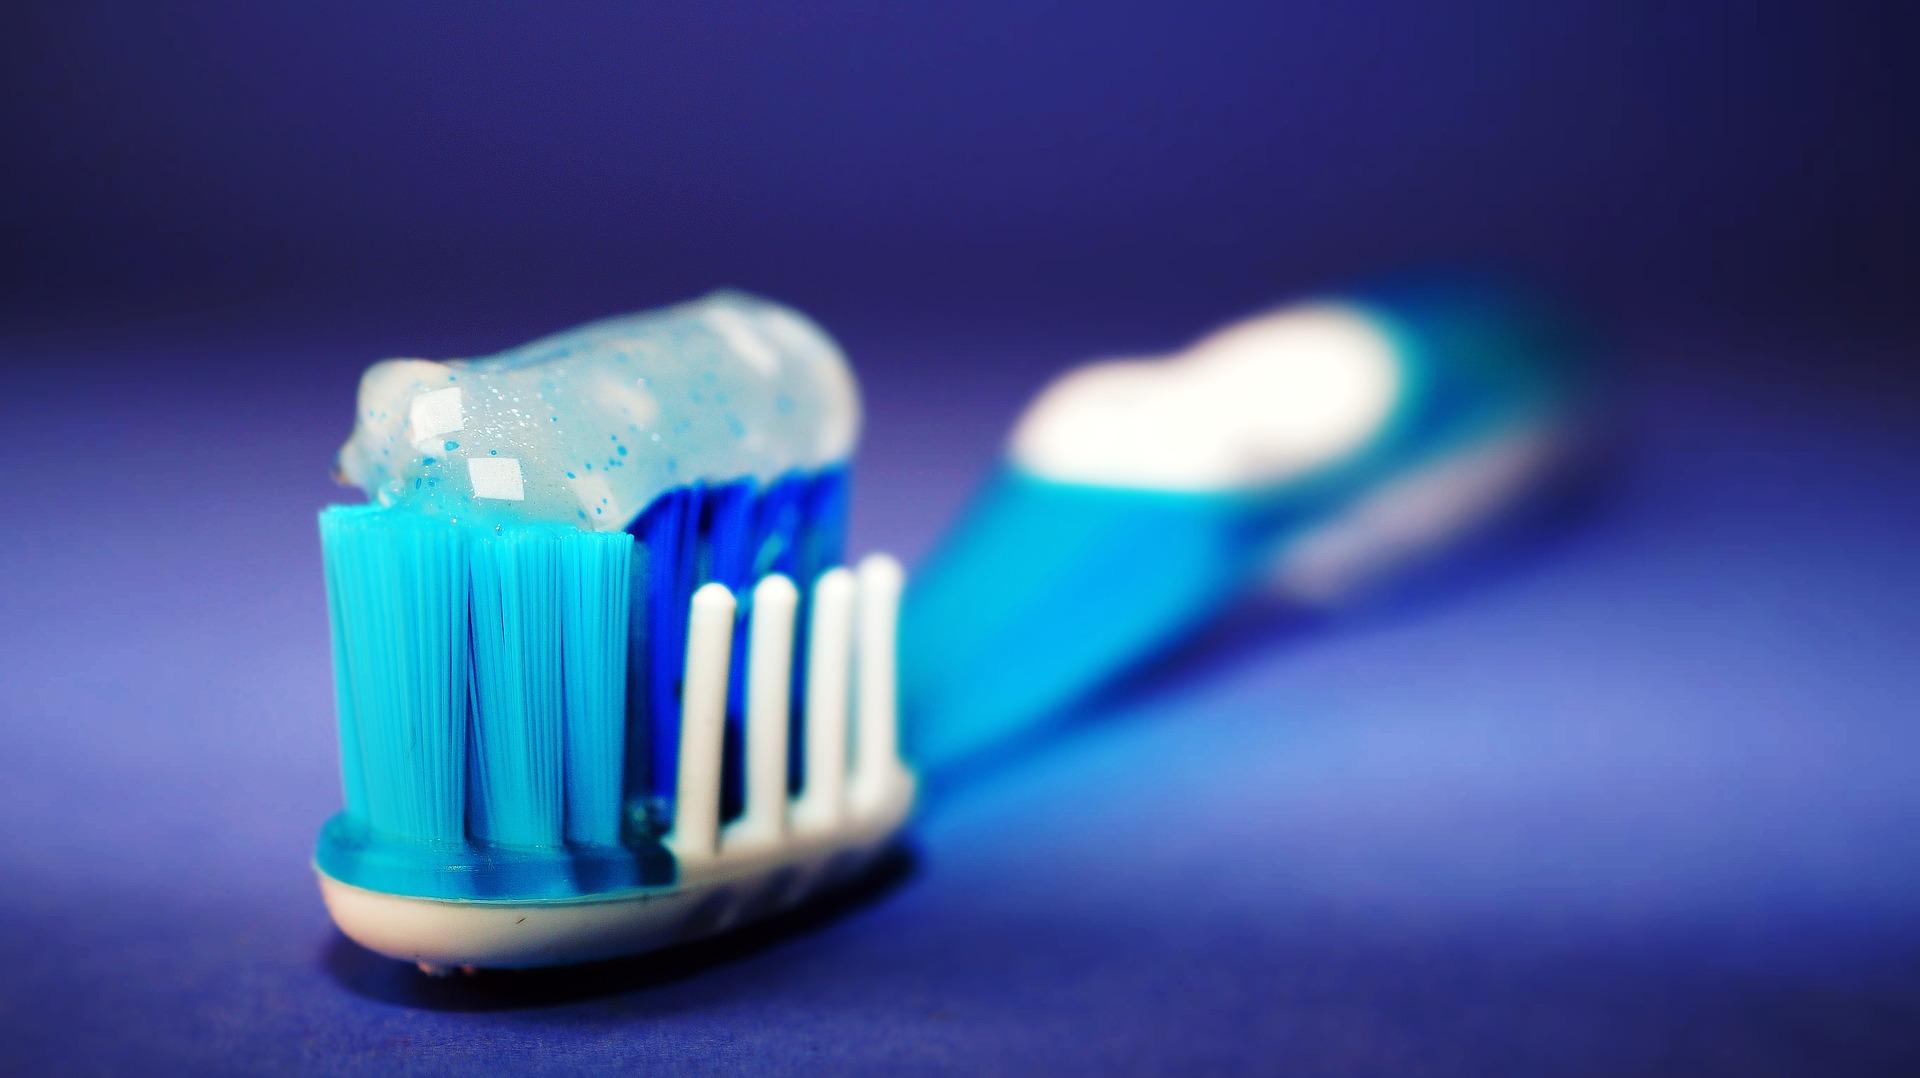 pastă de dinți - sfatulparintilor.ro - pixabay_com - toothbrush-2589480_1920